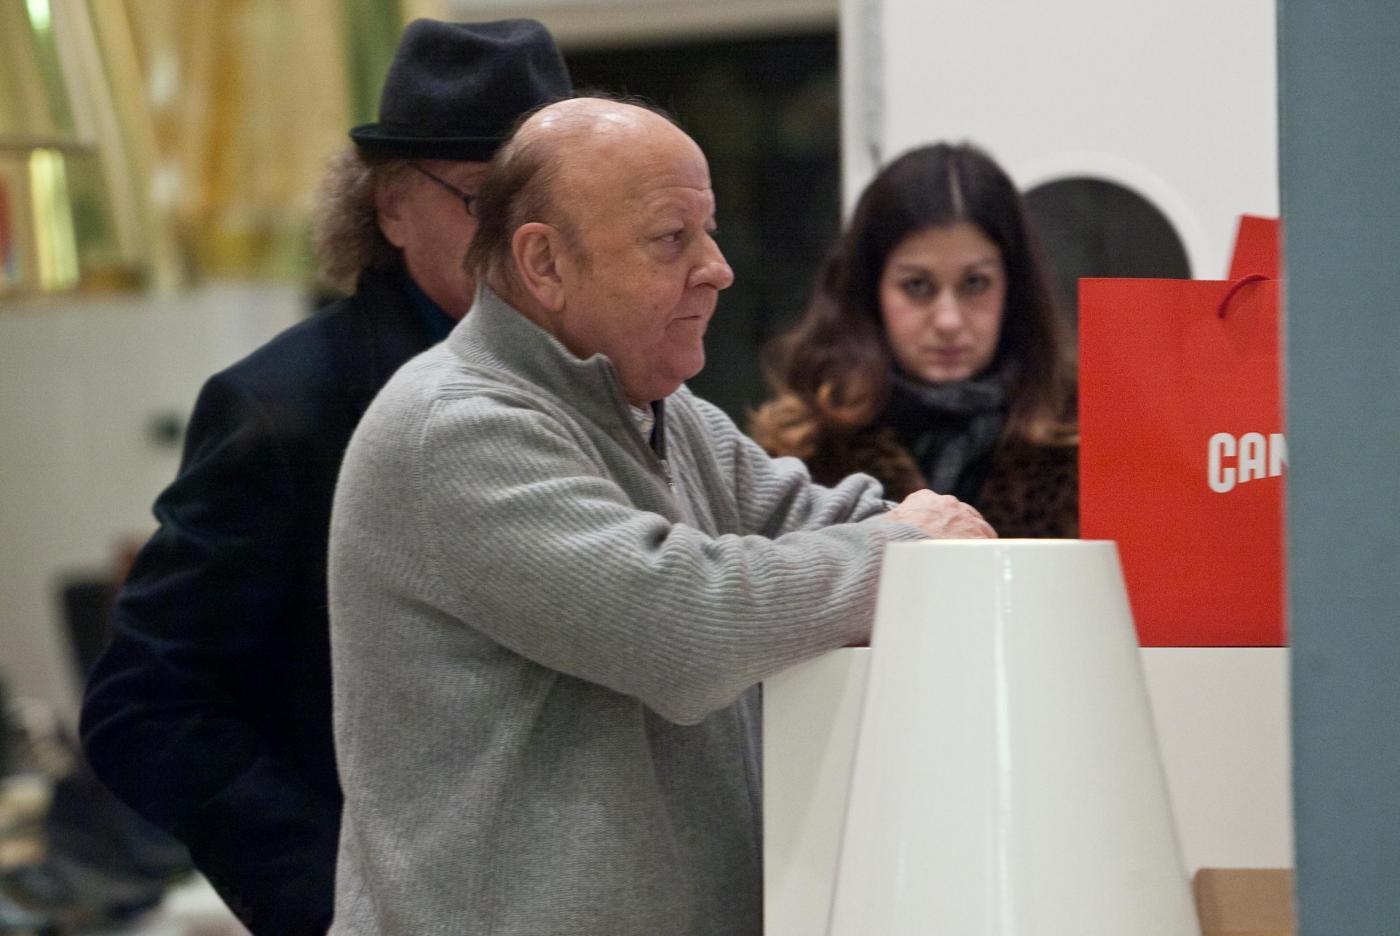 Massimo Boldi compra ciabatte meglio a righe o a tinta unica3